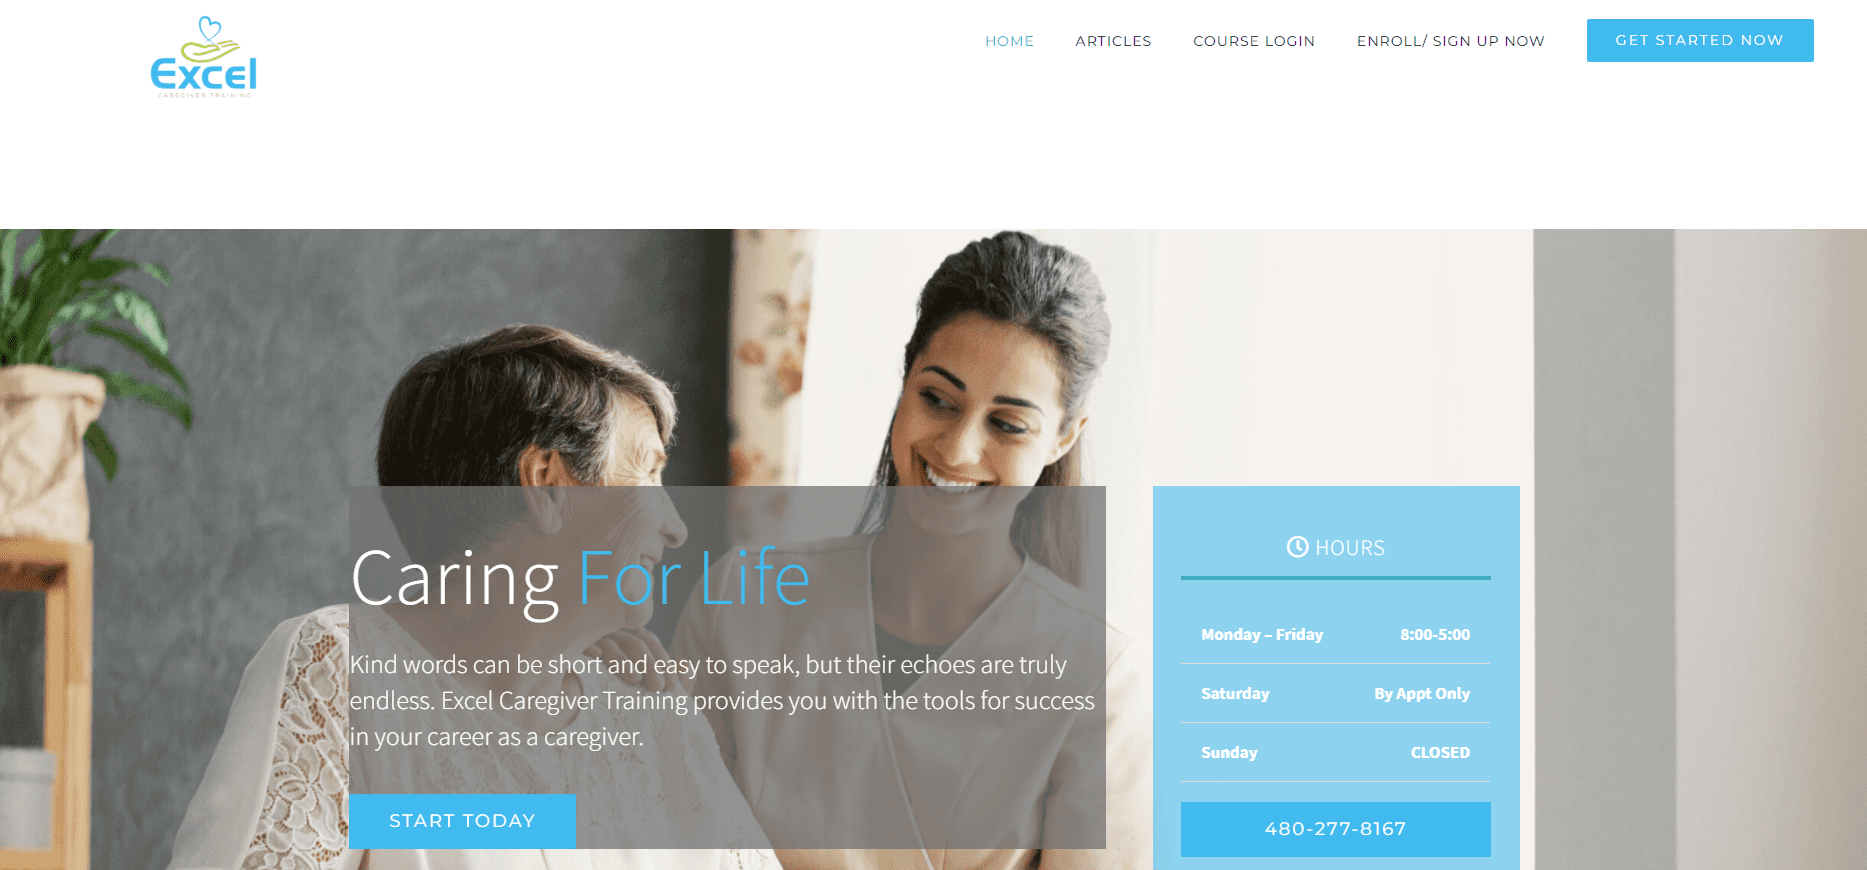 excel caregiver training homepage screenshot